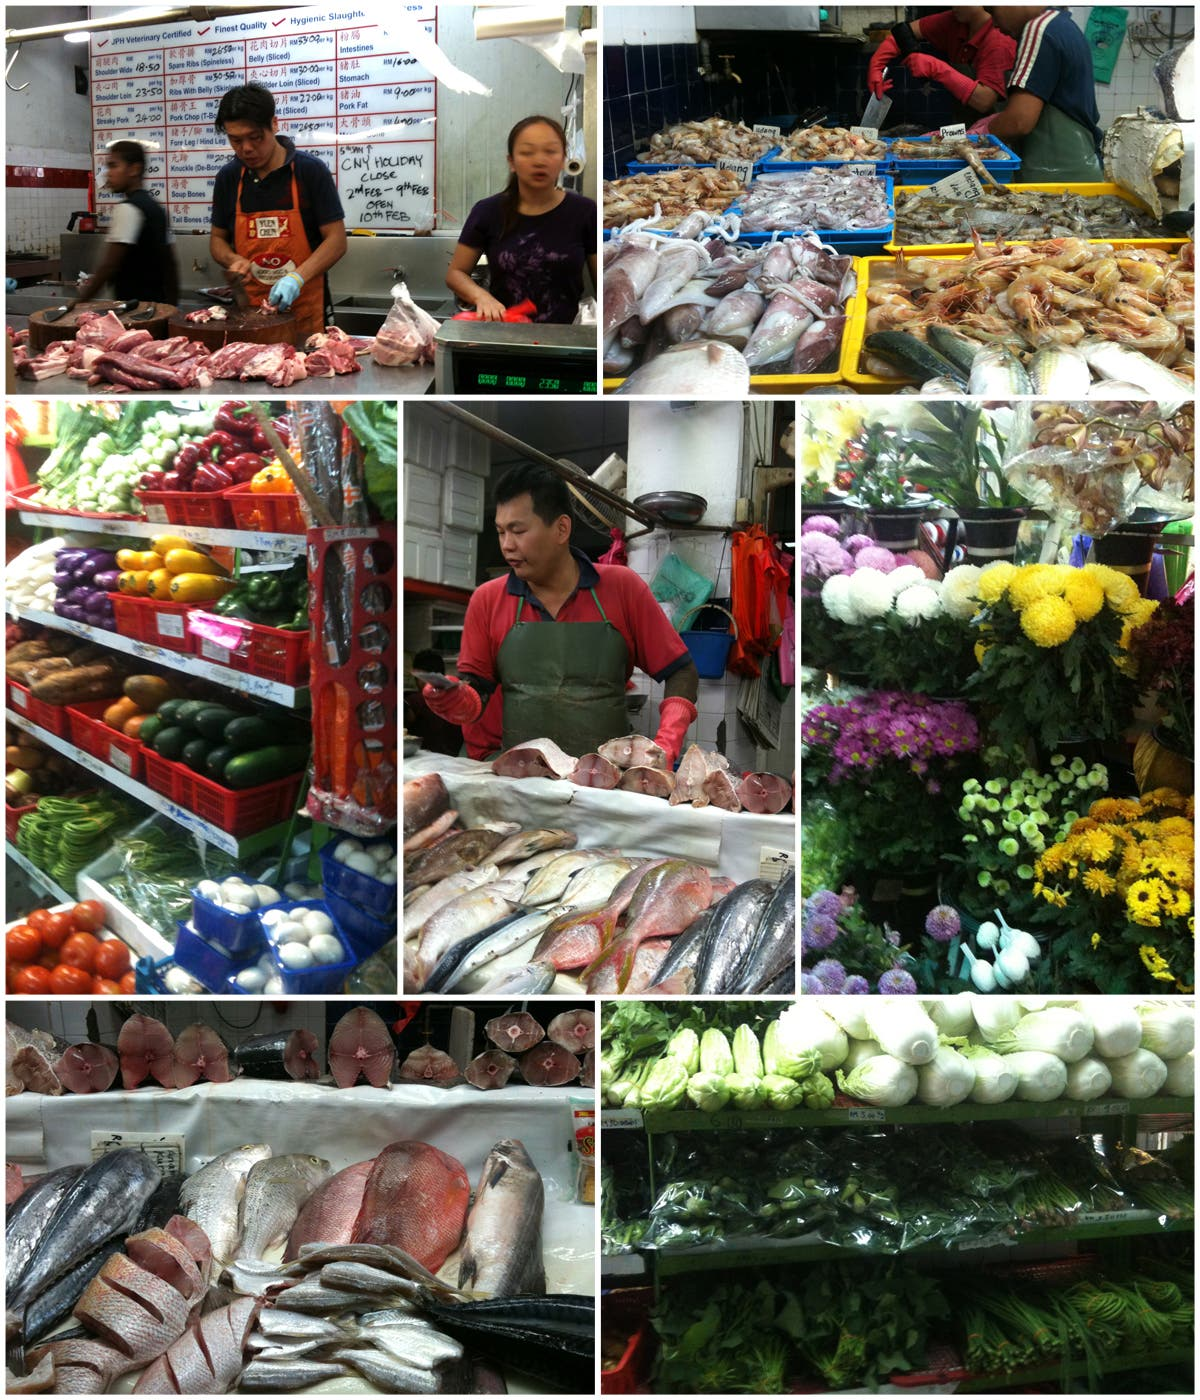 Las compras en Kuala Lumpur